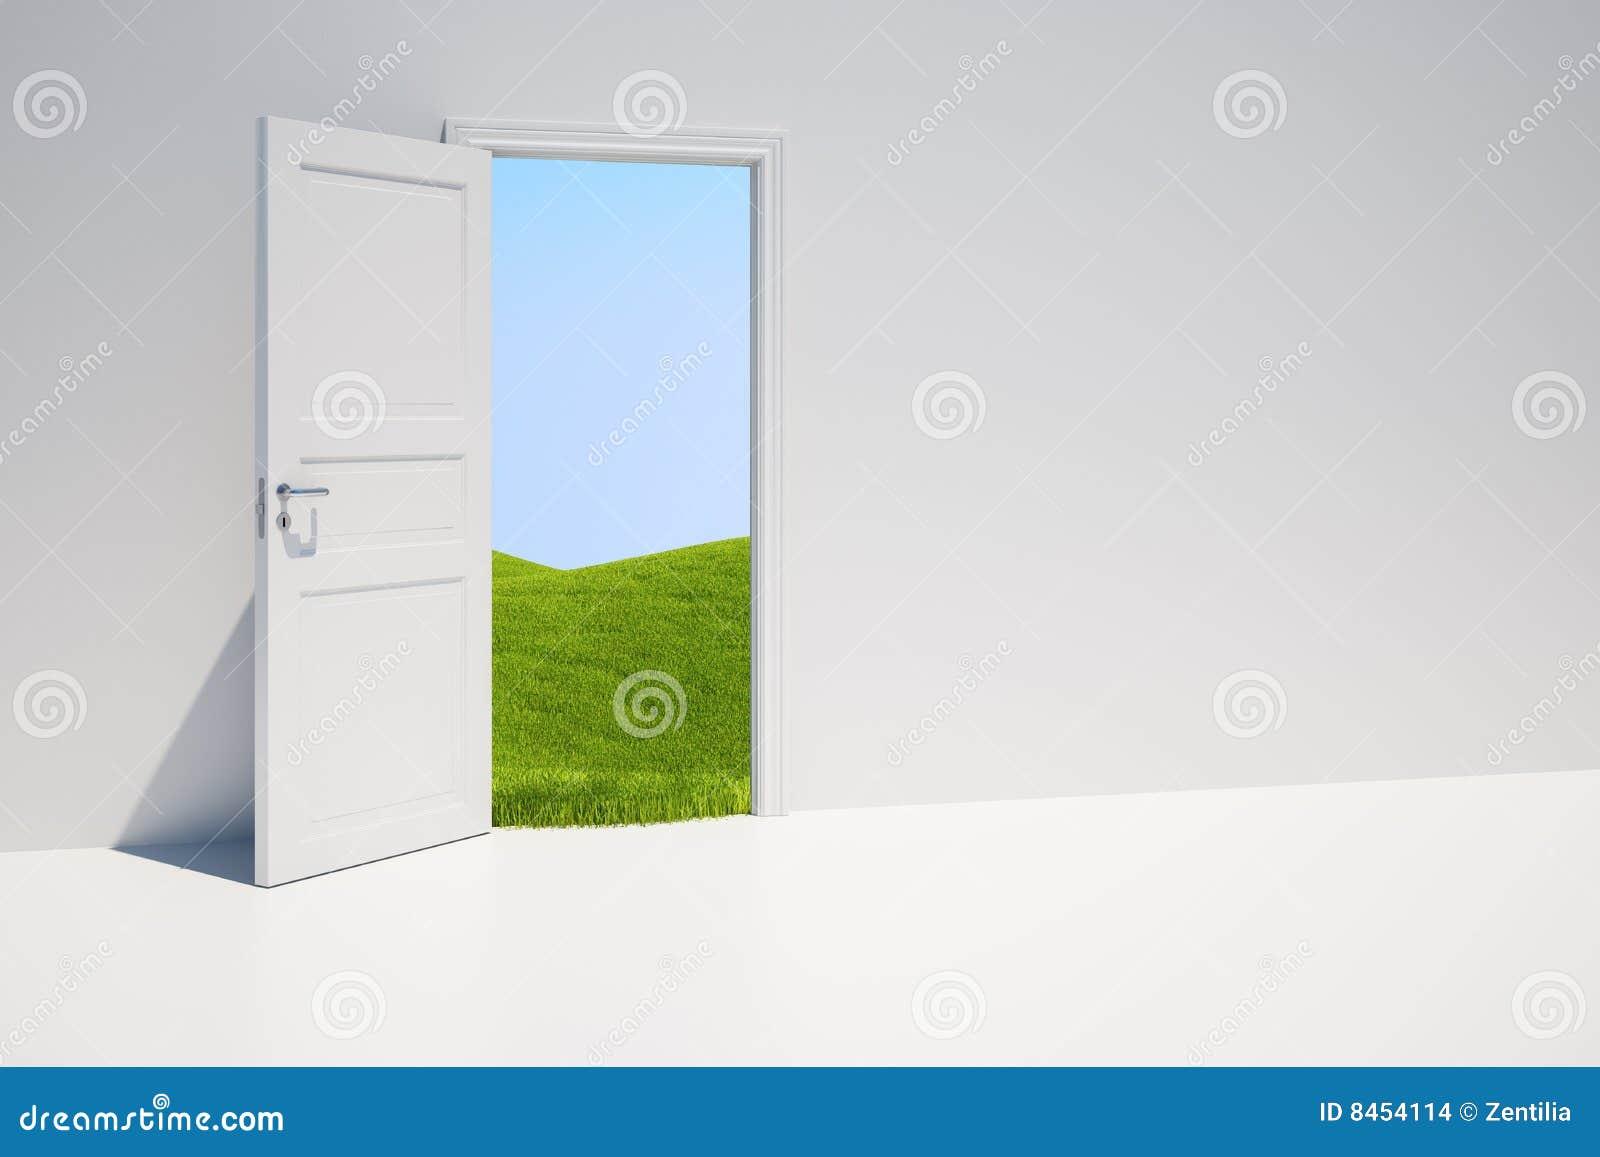 Dörrfältgräs